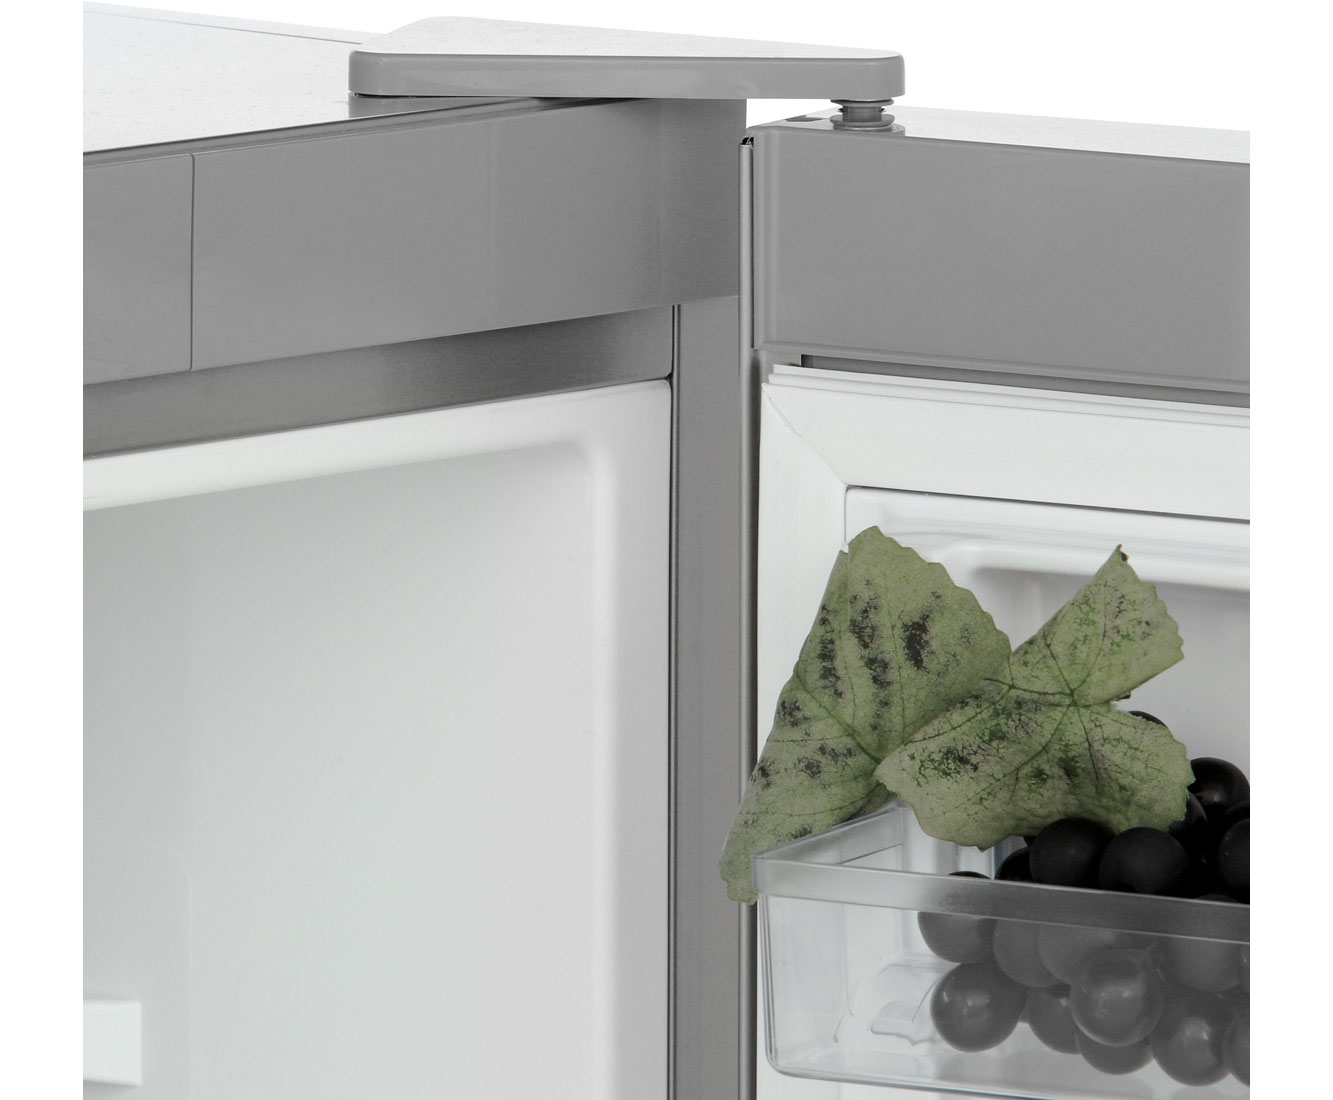 Gorenje Kühlschrank R 6192 Fw : Gorenje r6192fw kühlschrank weiß a